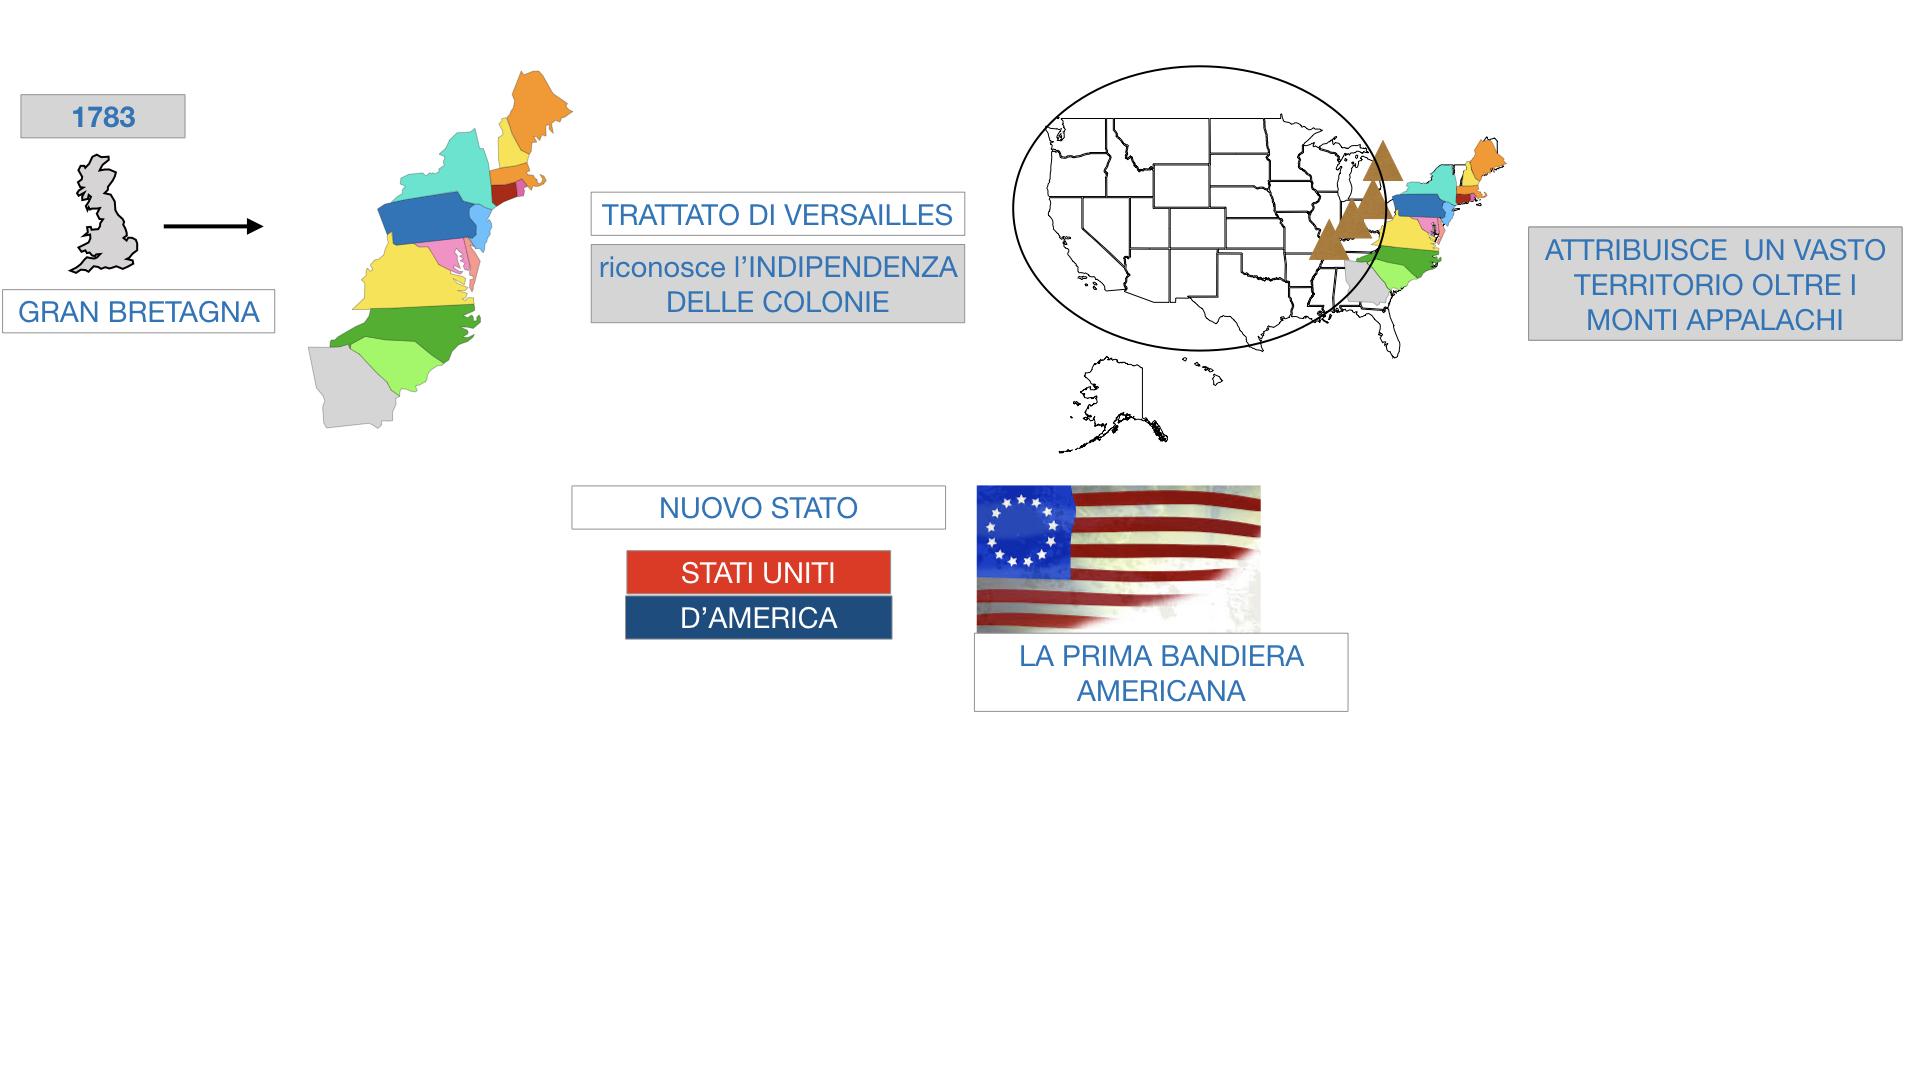 GUERRA DI INDIPENDENZA AMERICANA_SIMULAZIONE.145